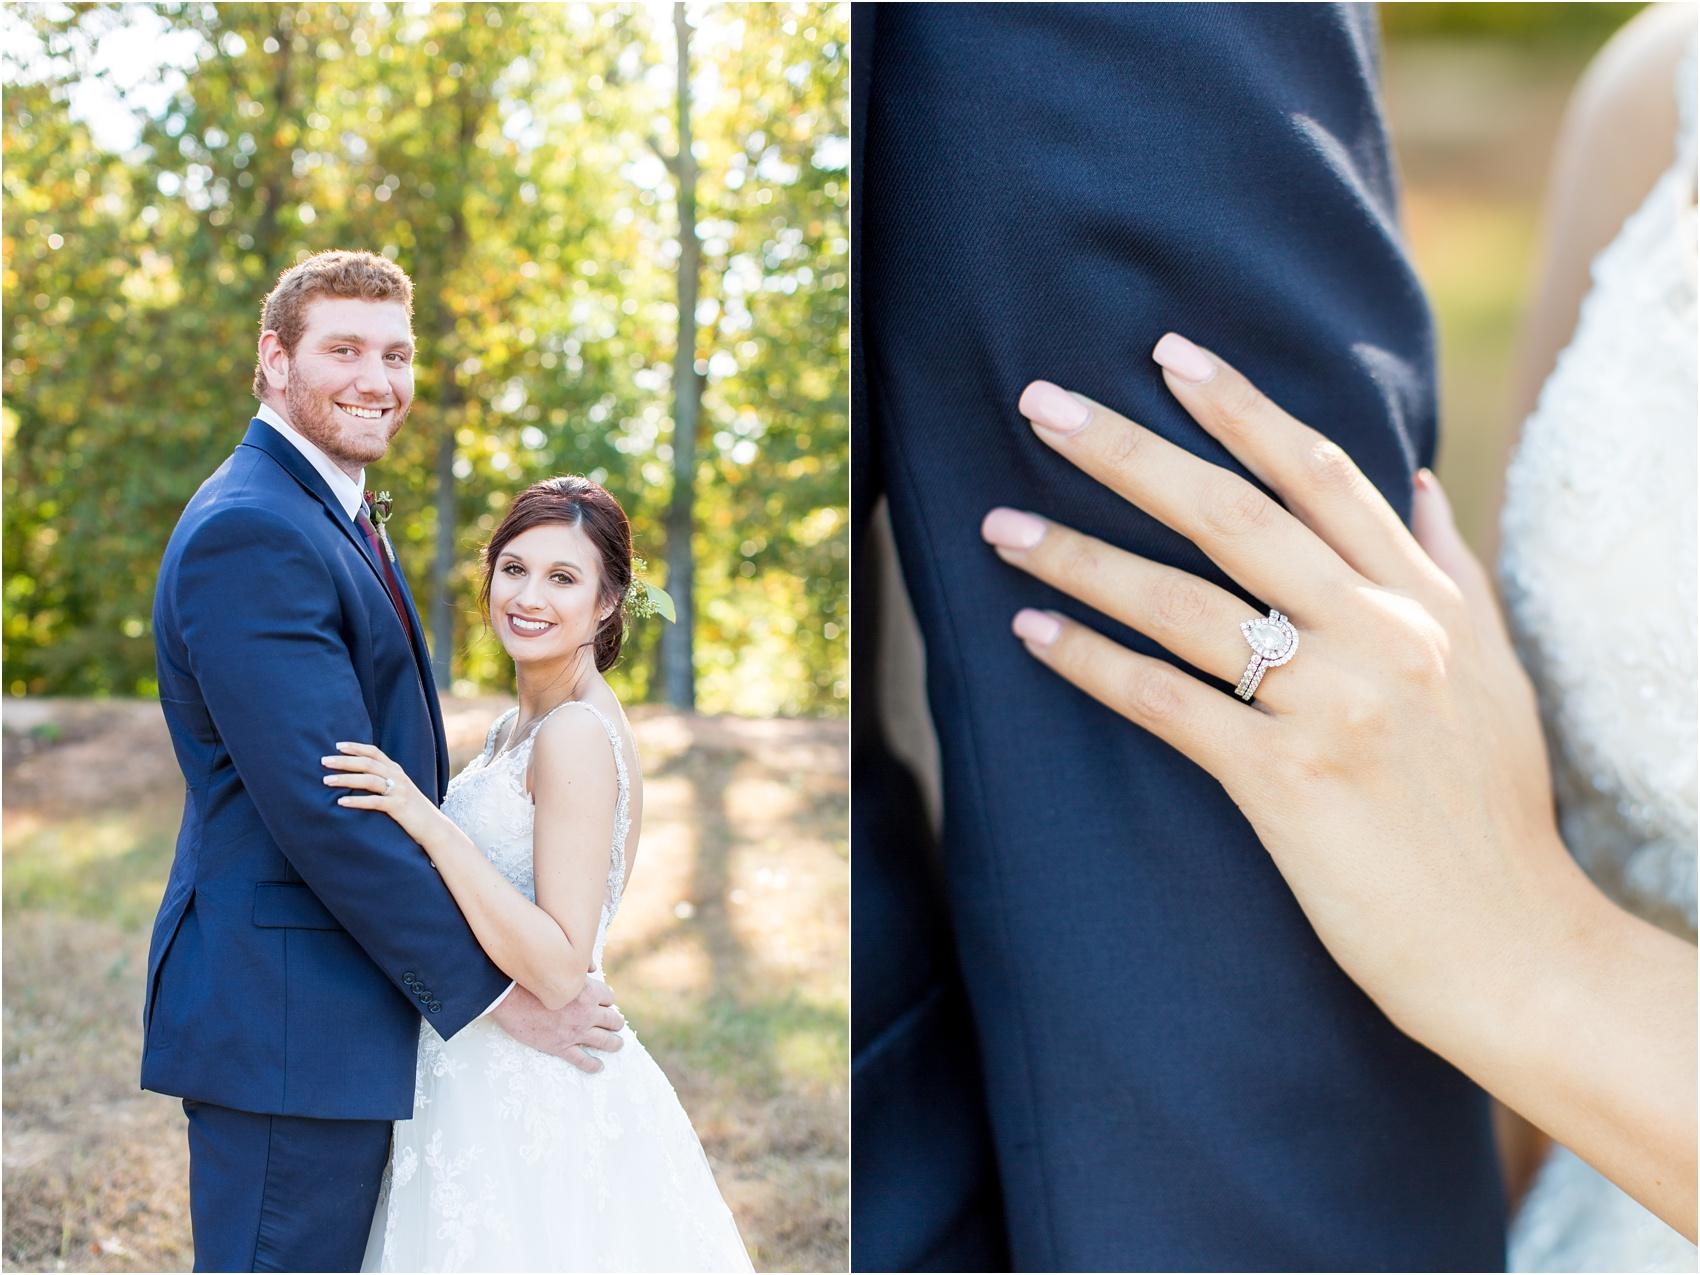 Savannah Eve Photography- May Wedding- Blog-36.jpg